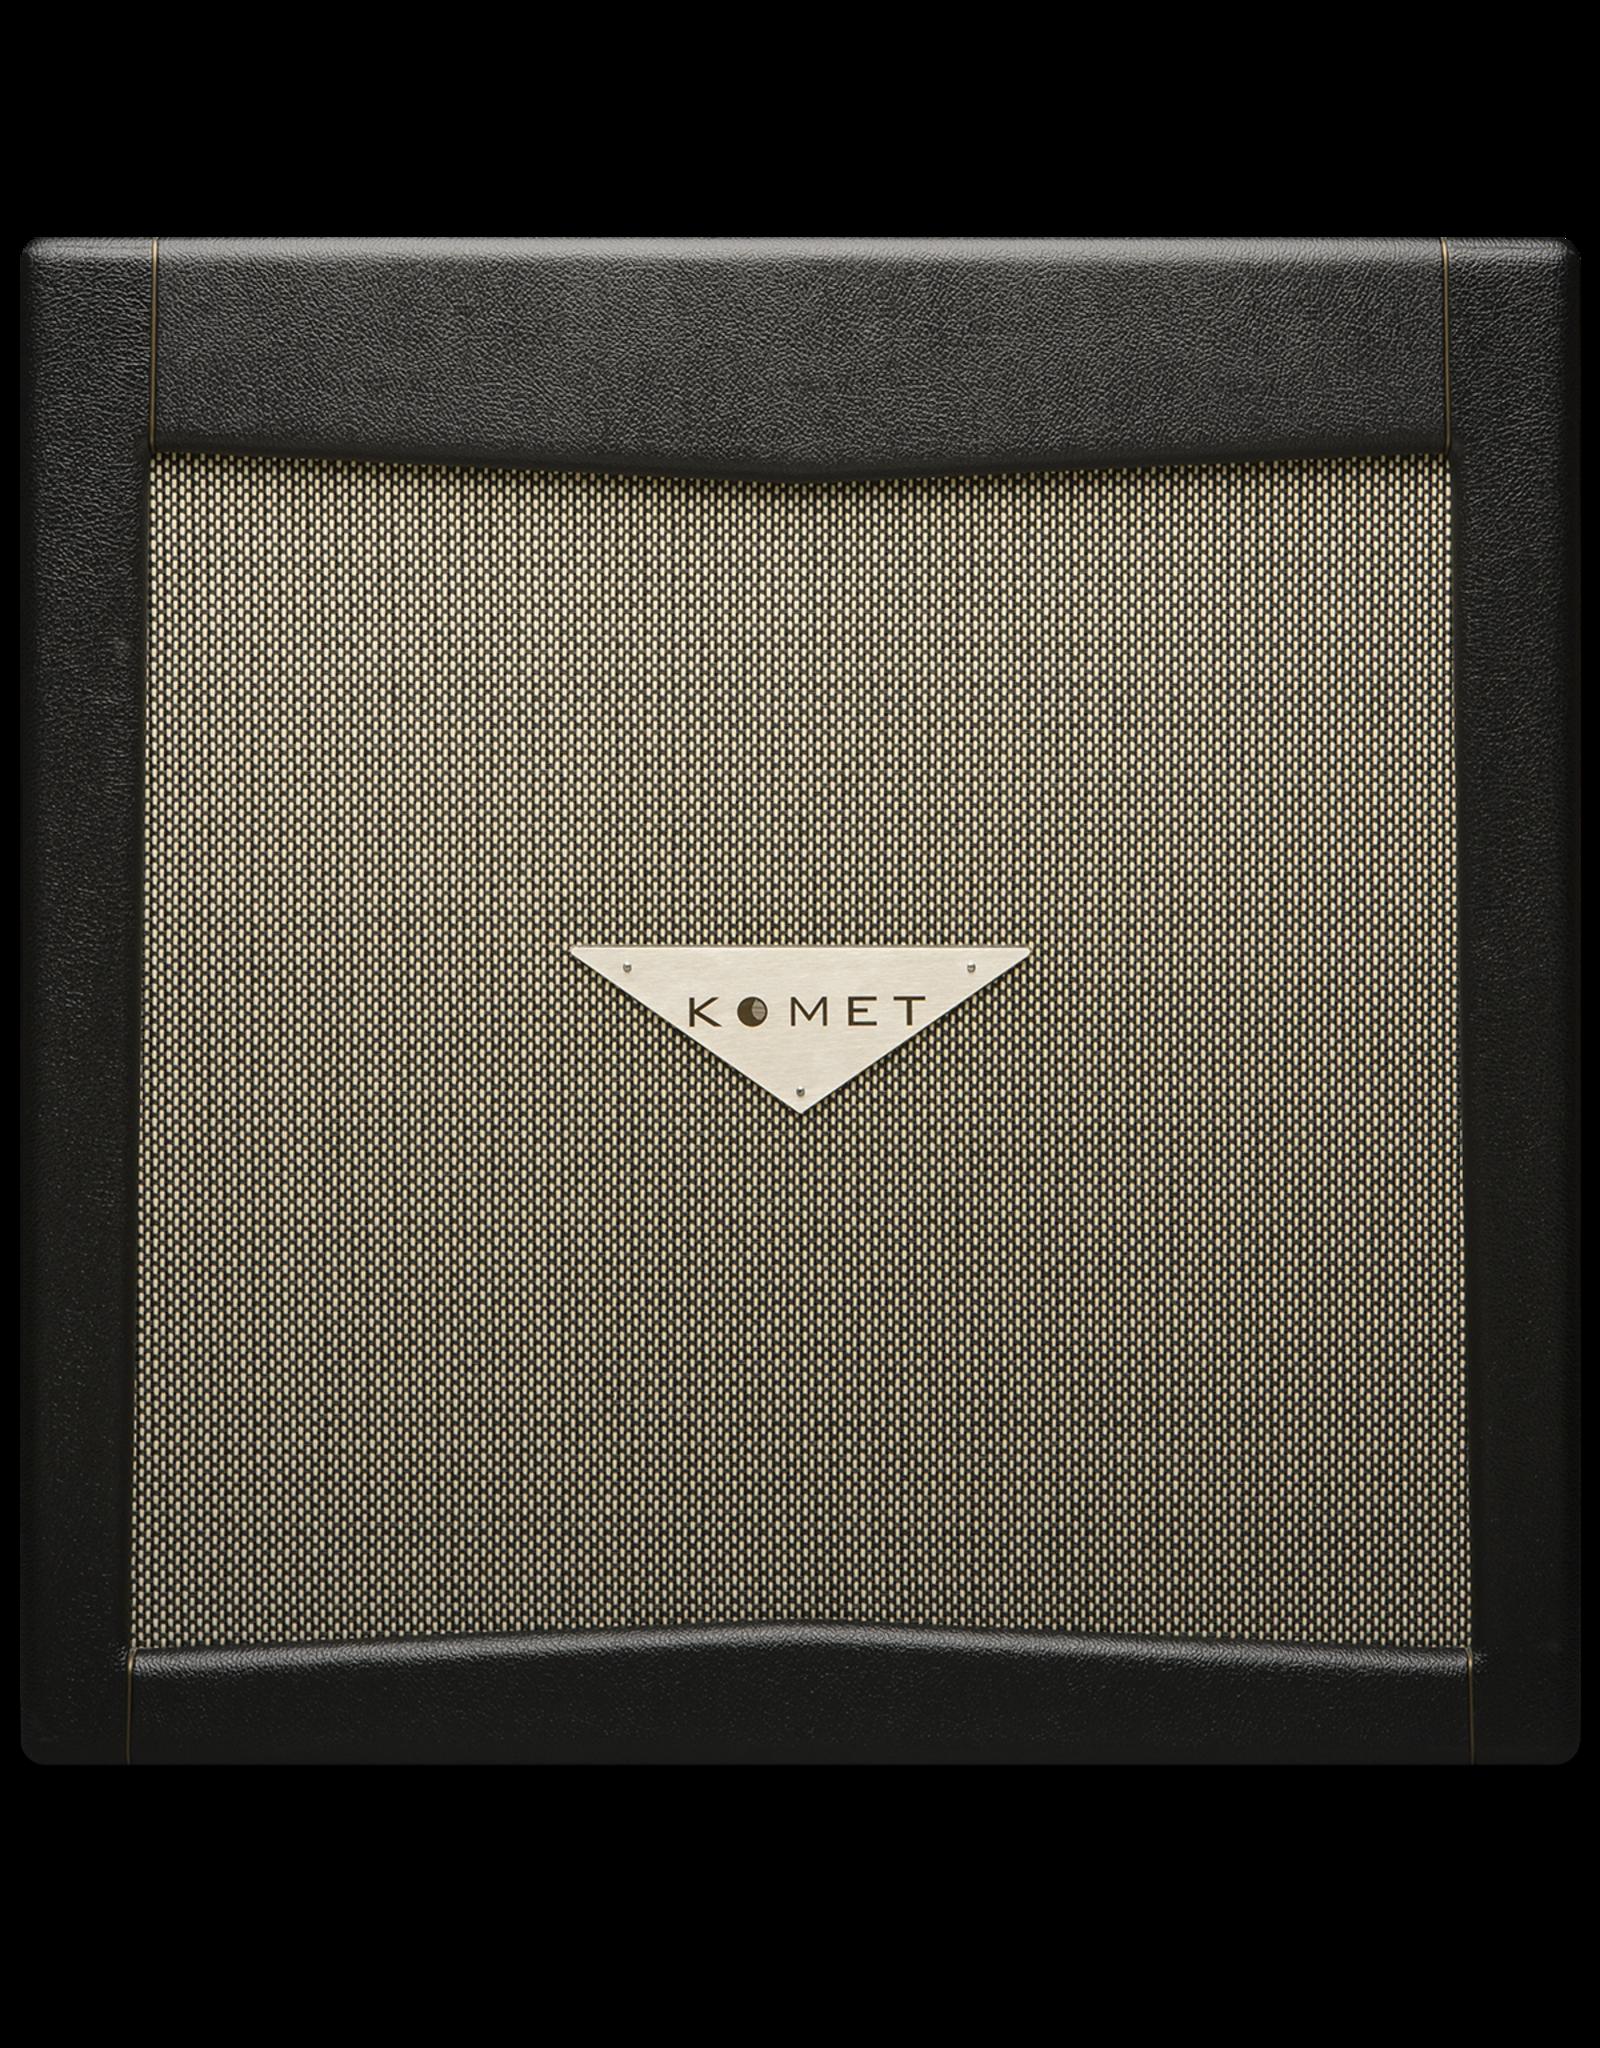 Komet Amps Komet 4x12 cabinet